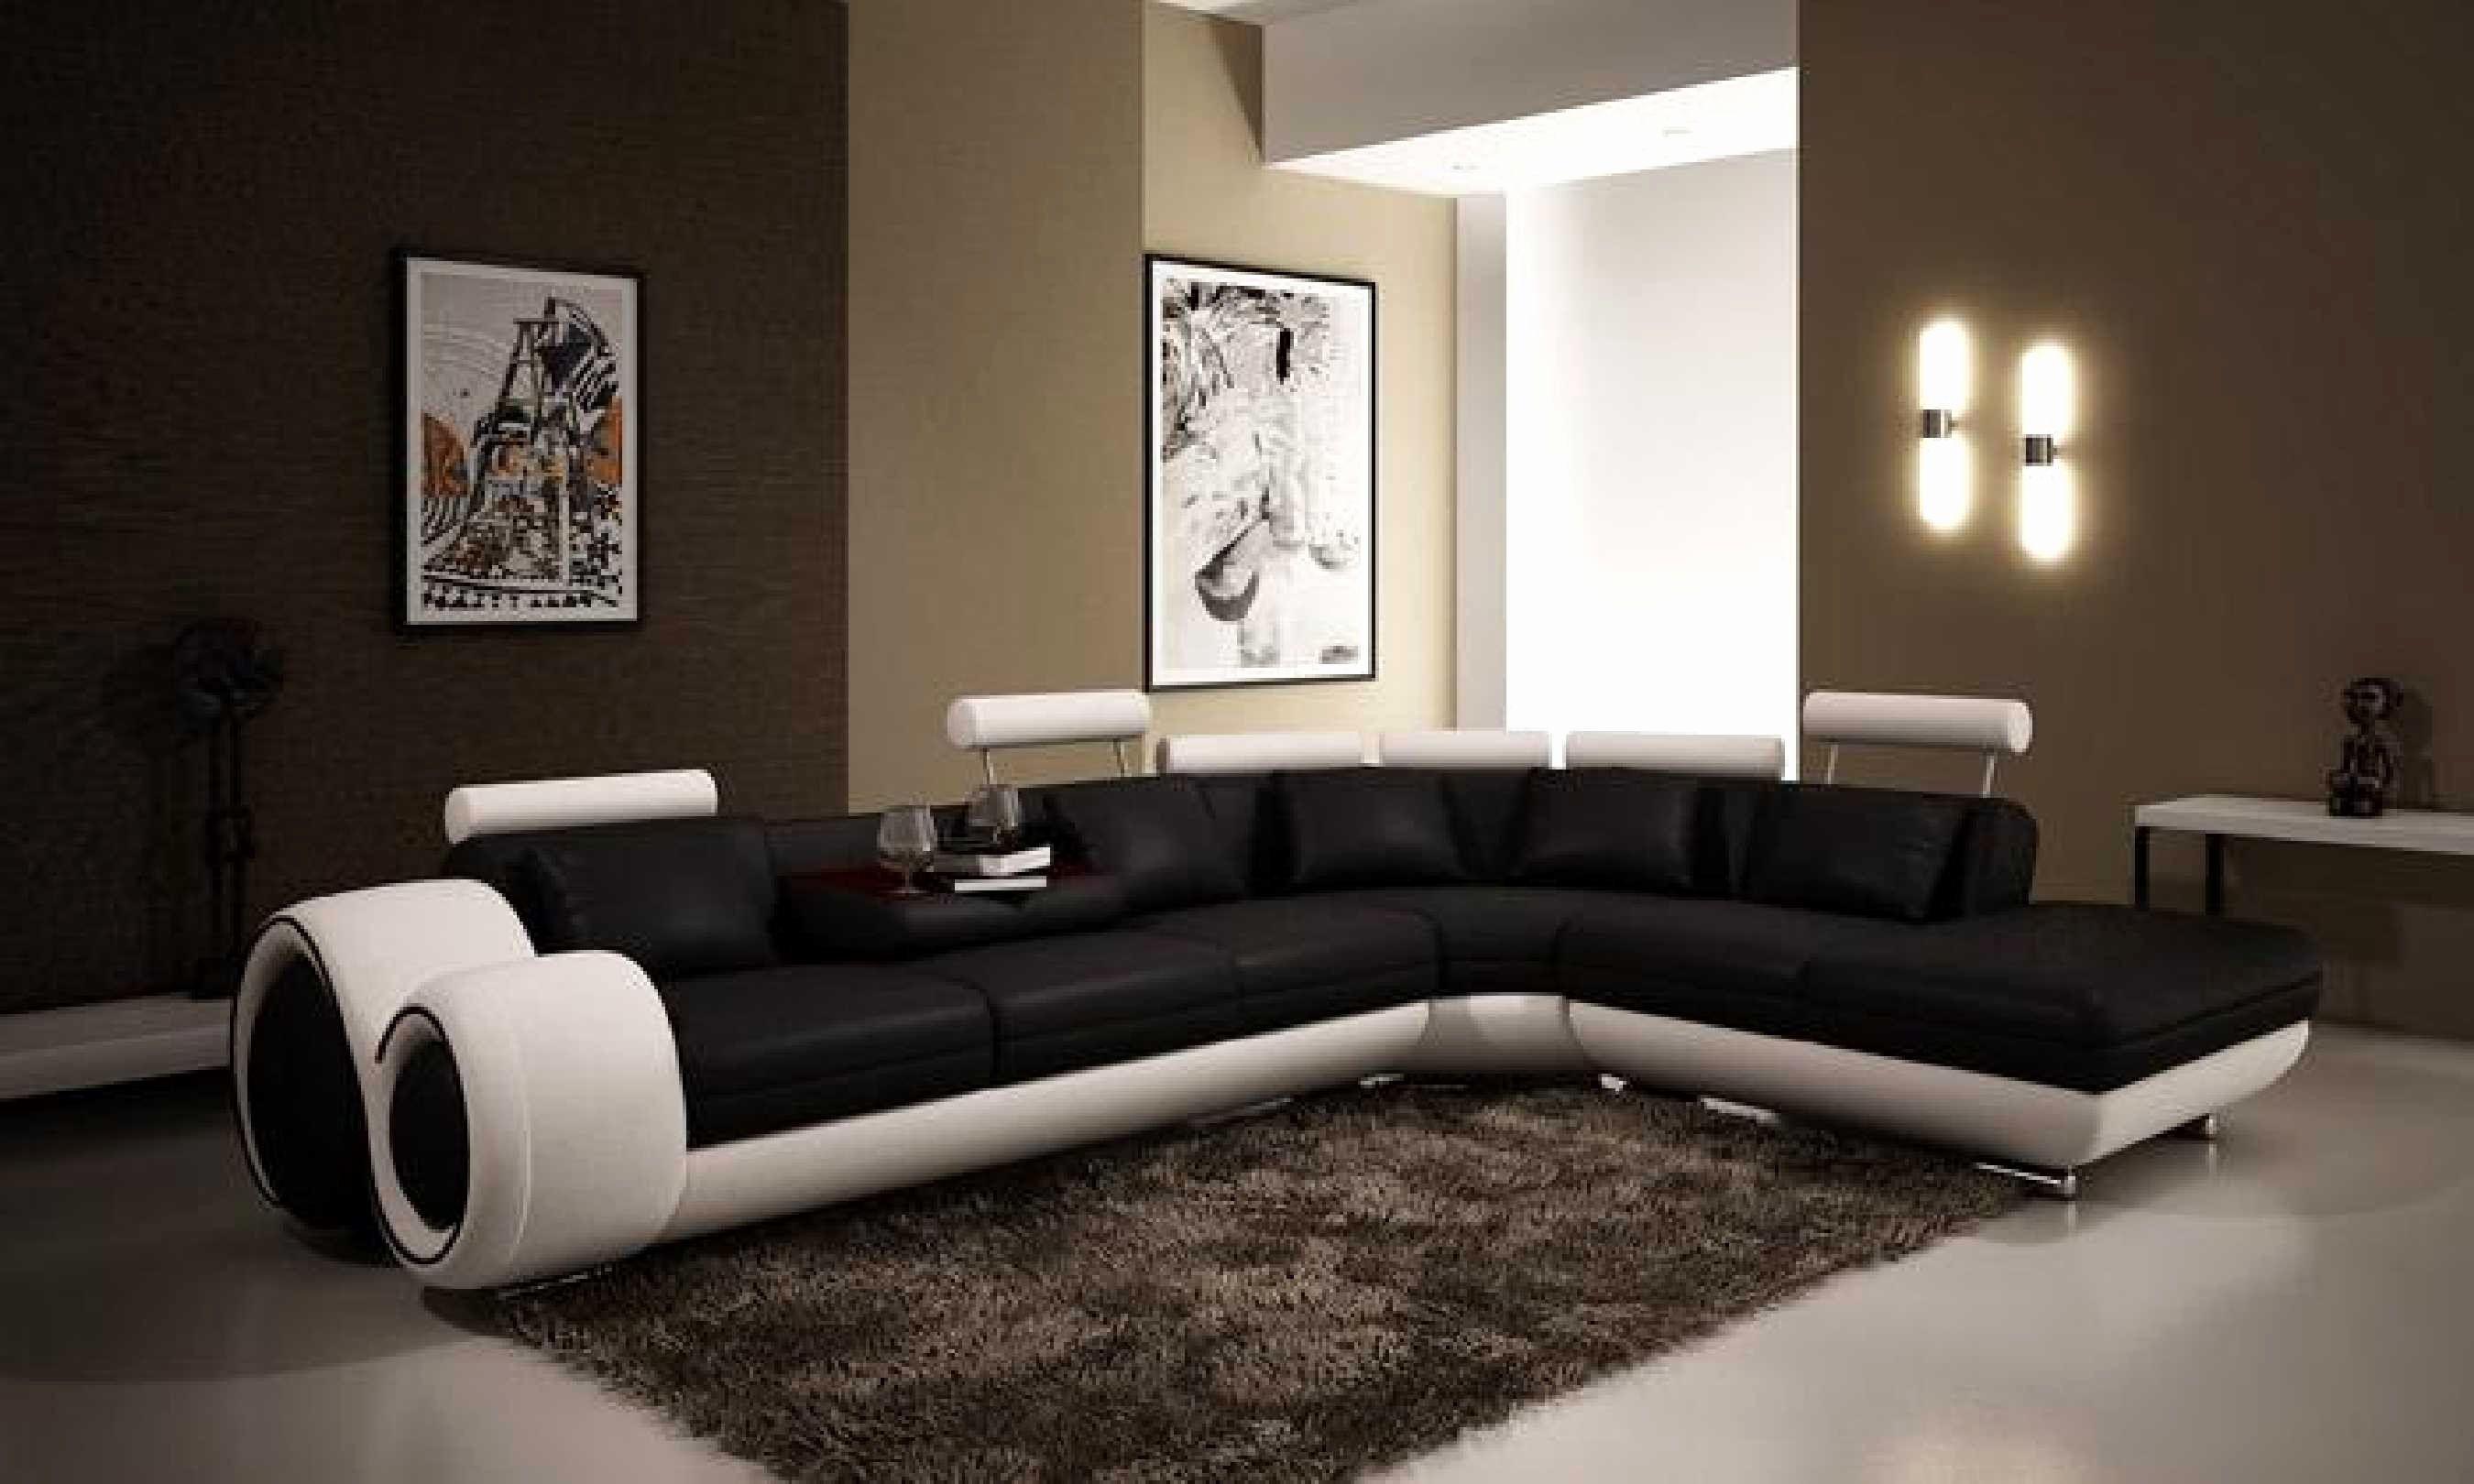 Luxury Modern Reclining Sectional Sofas Photos Modern Reclining